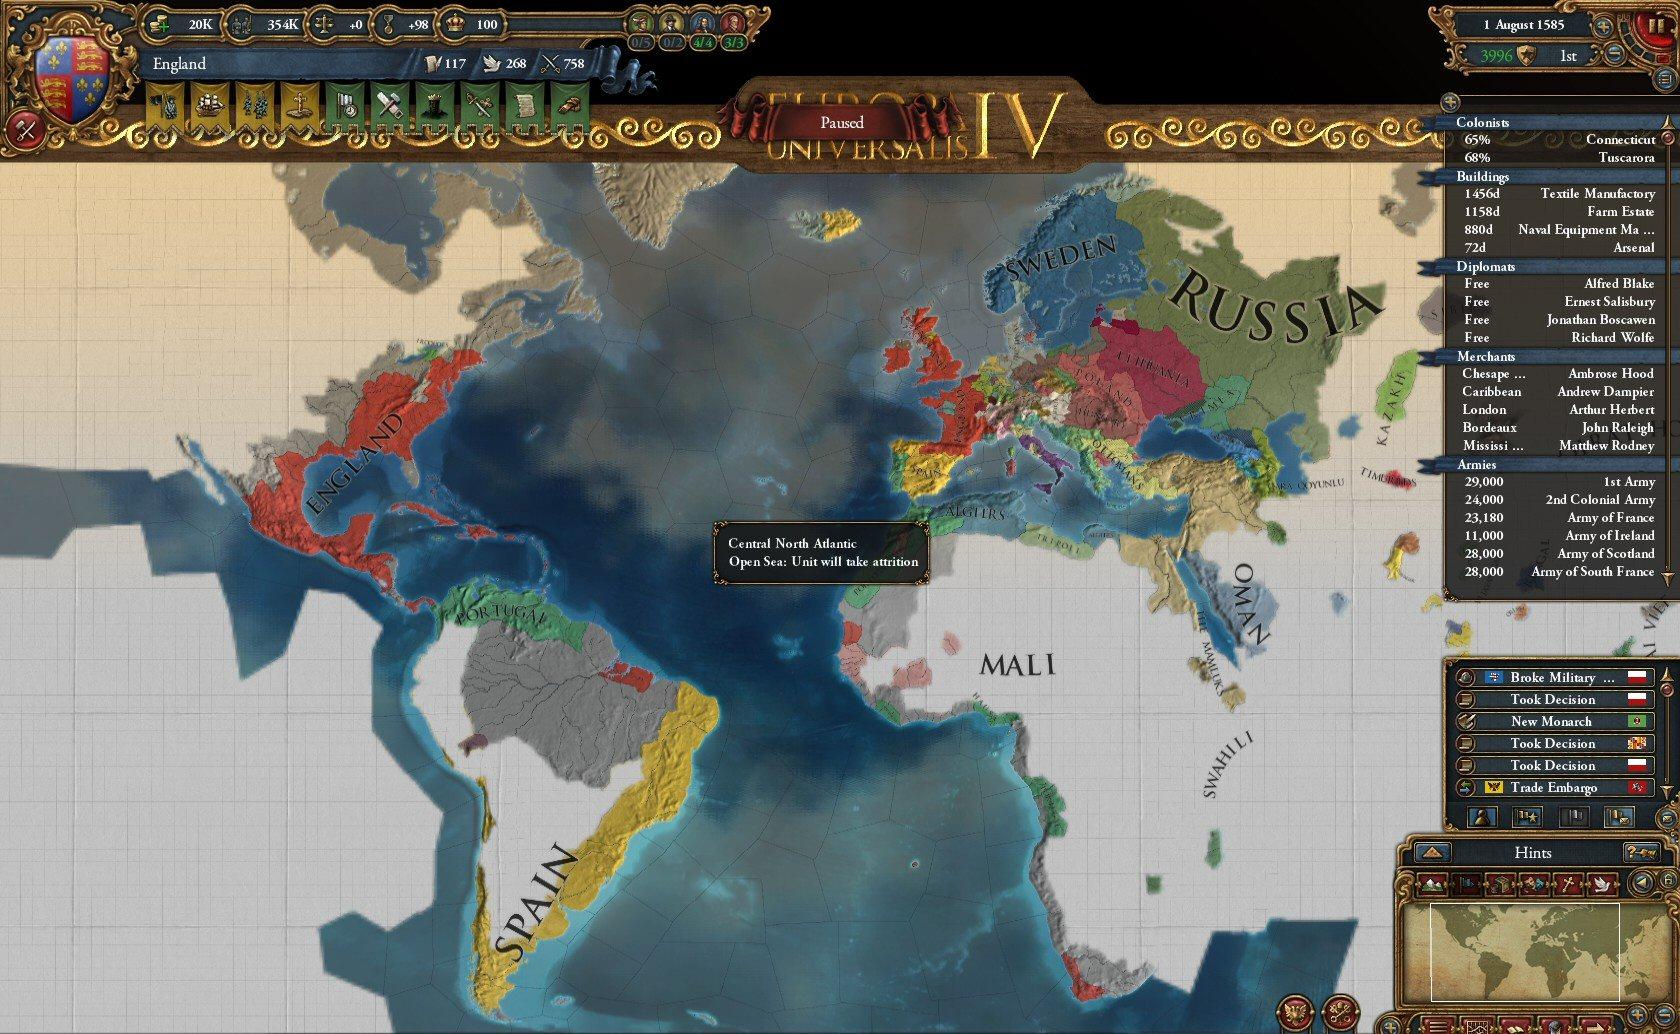 Europa universalis 4 trade system